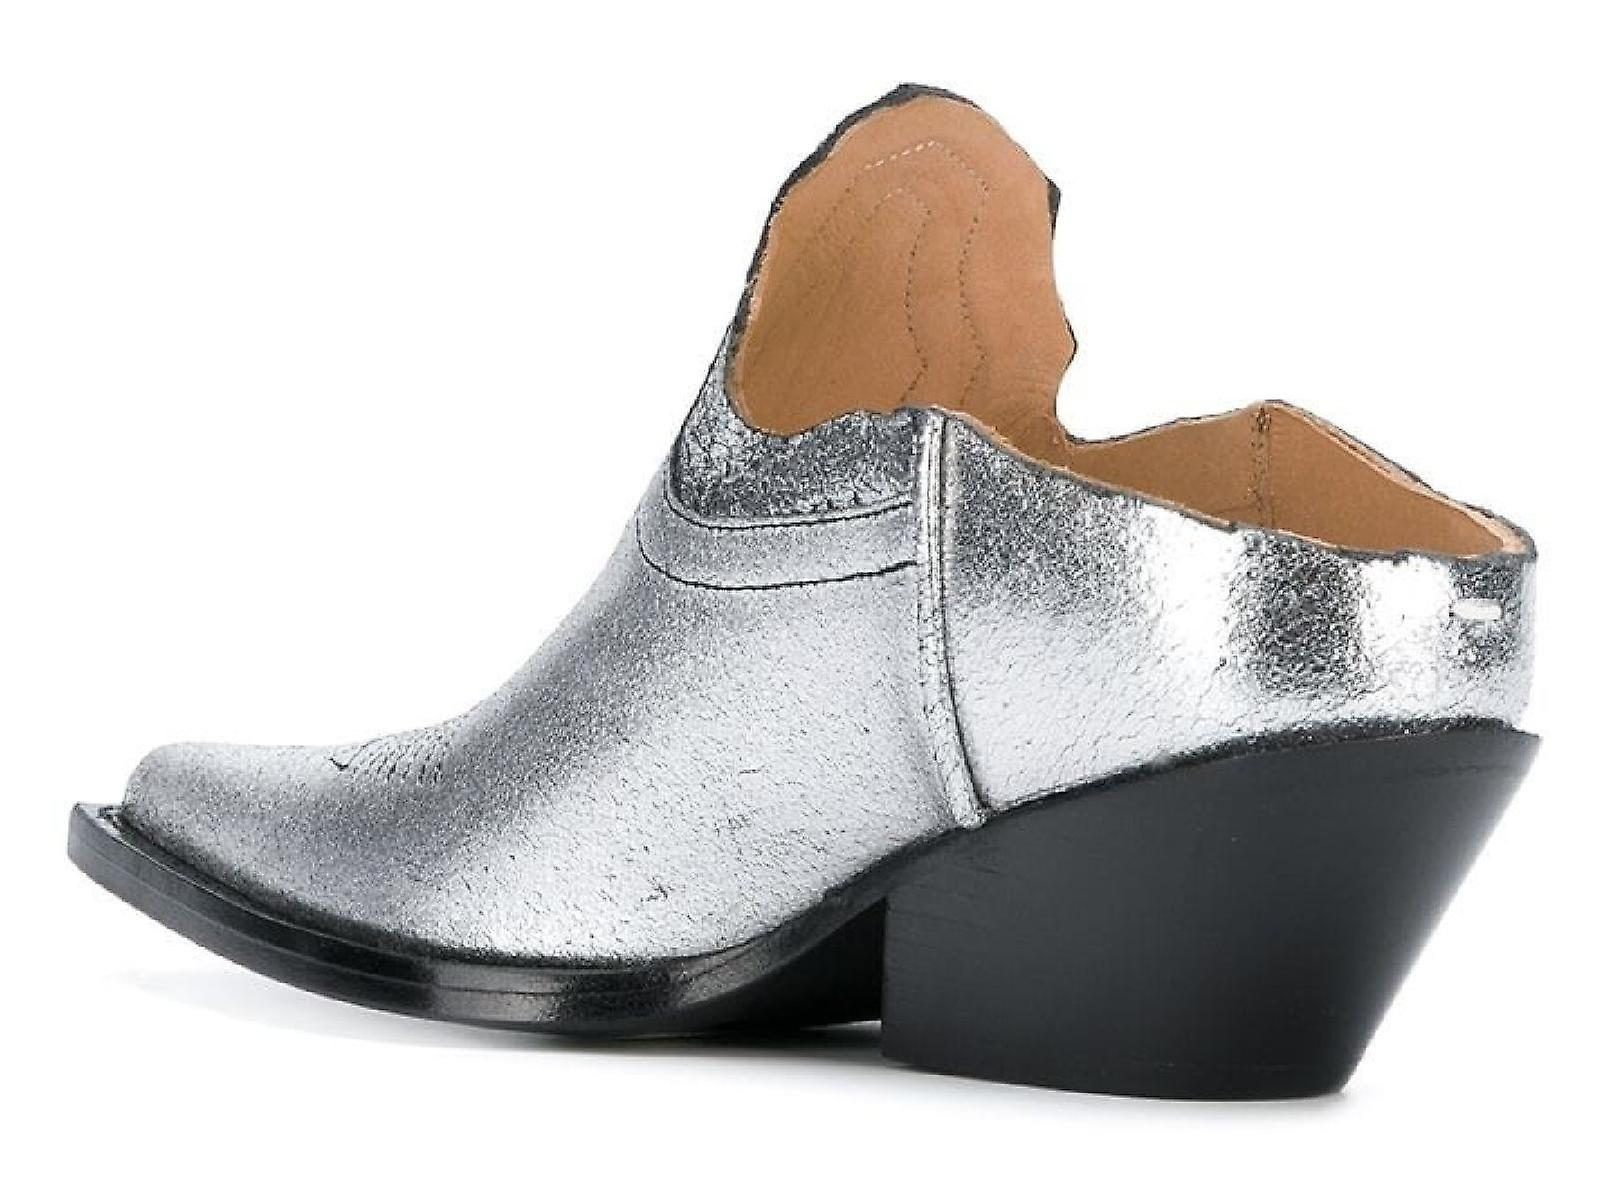 Maison Margiela S58wu0231p1987h4391 Women's Silver Leather Slippers 1jc1Hv